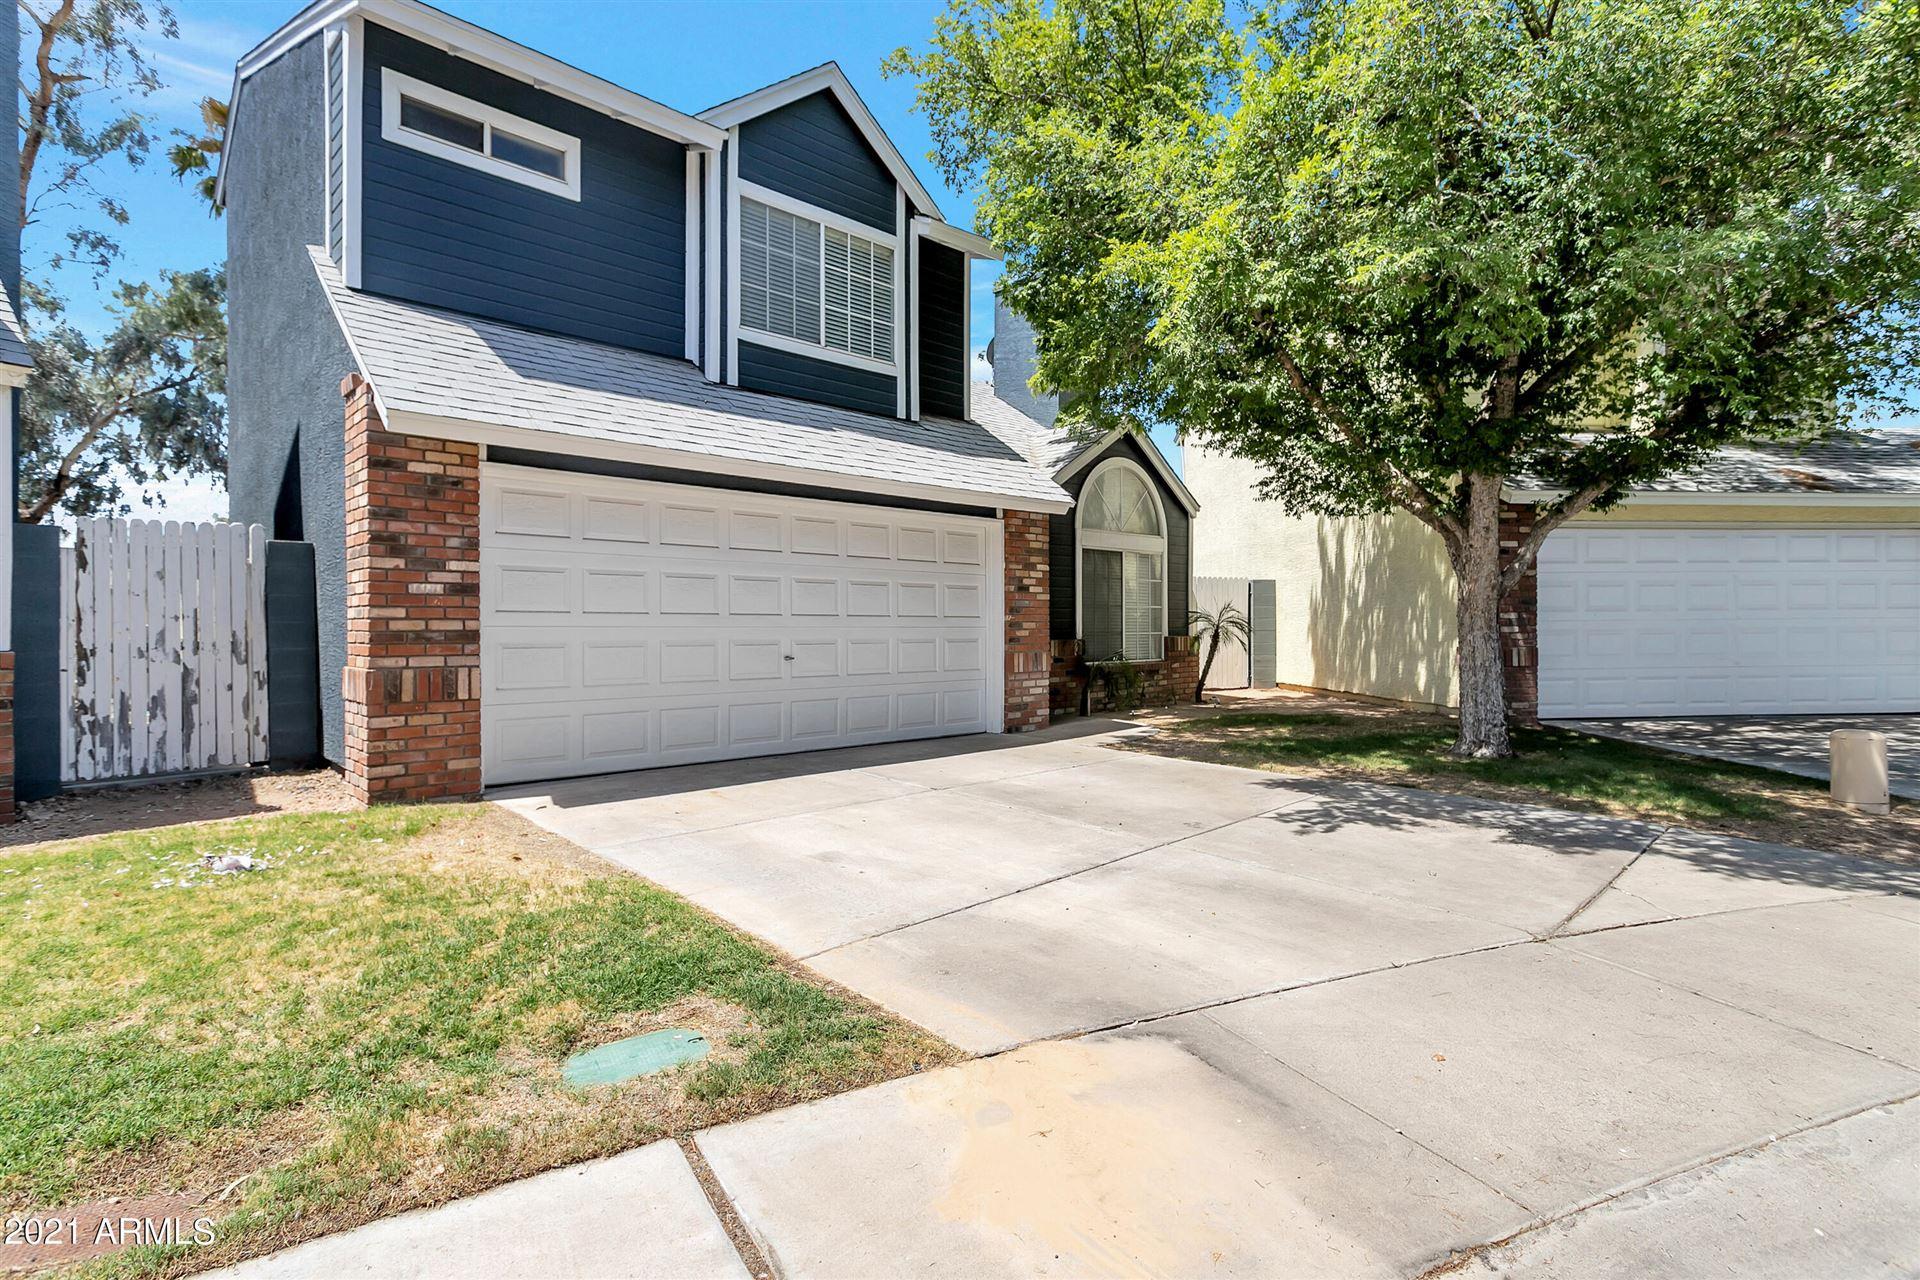 431 W RENEE Drive, Phoenix, AZ 85027 - MLS#: 6248612